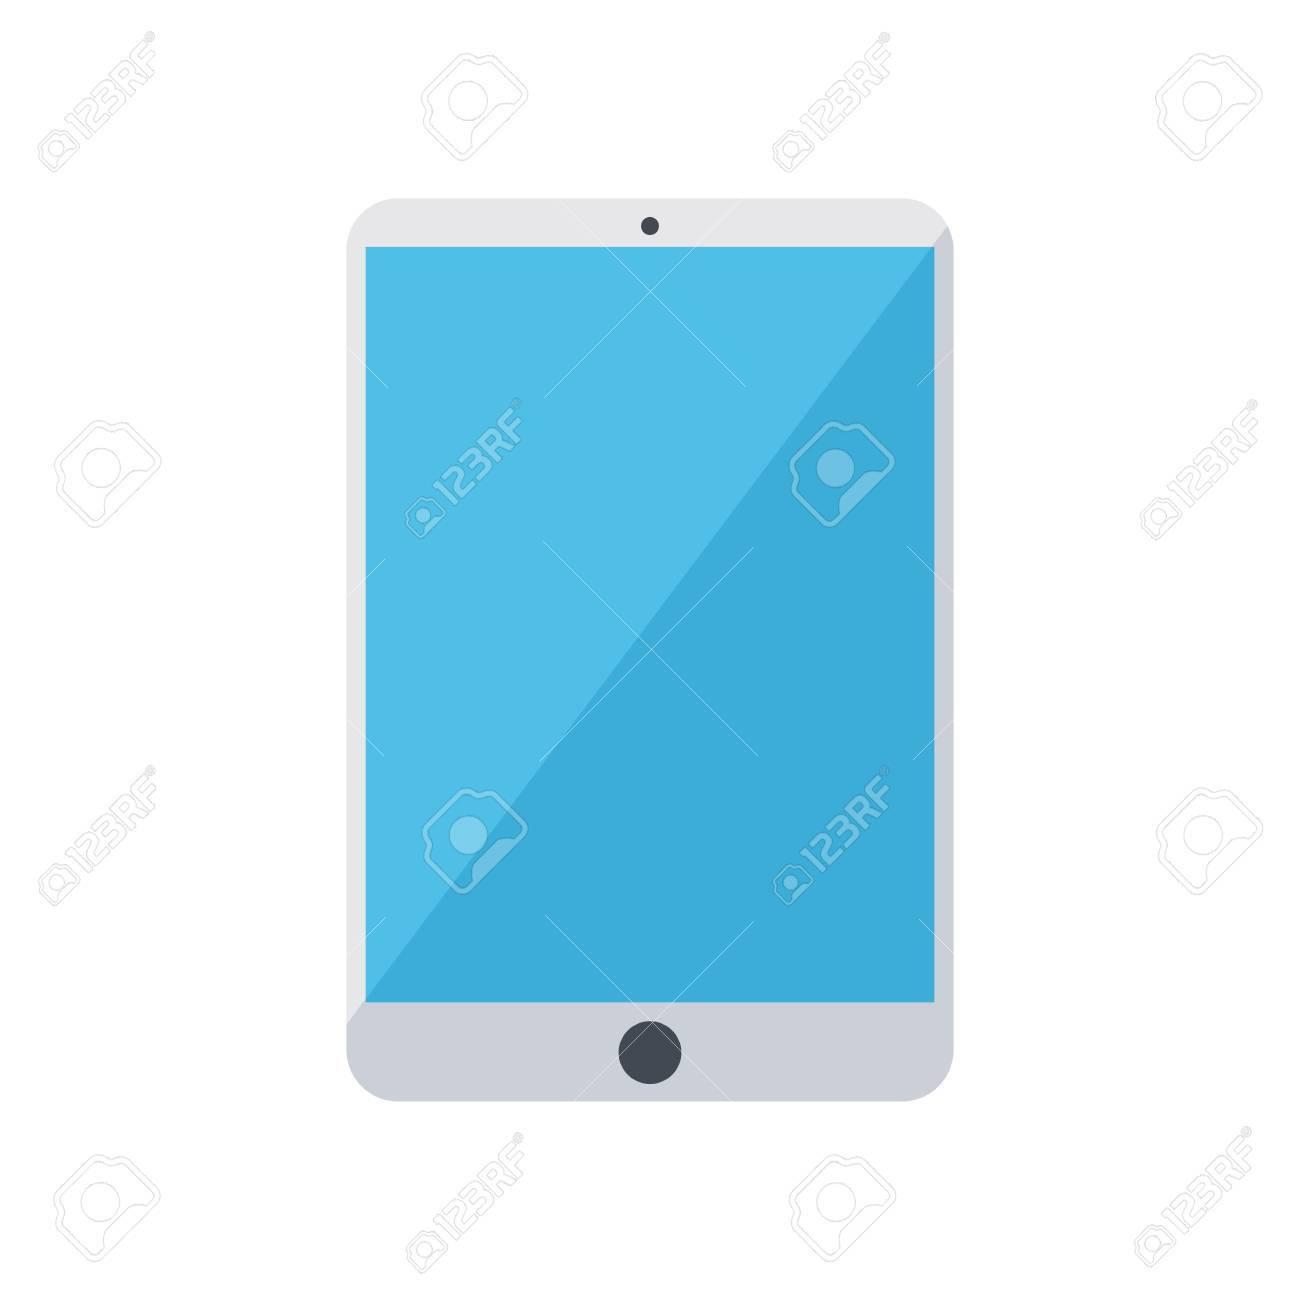 Tablet. Stock Vector - 37673364